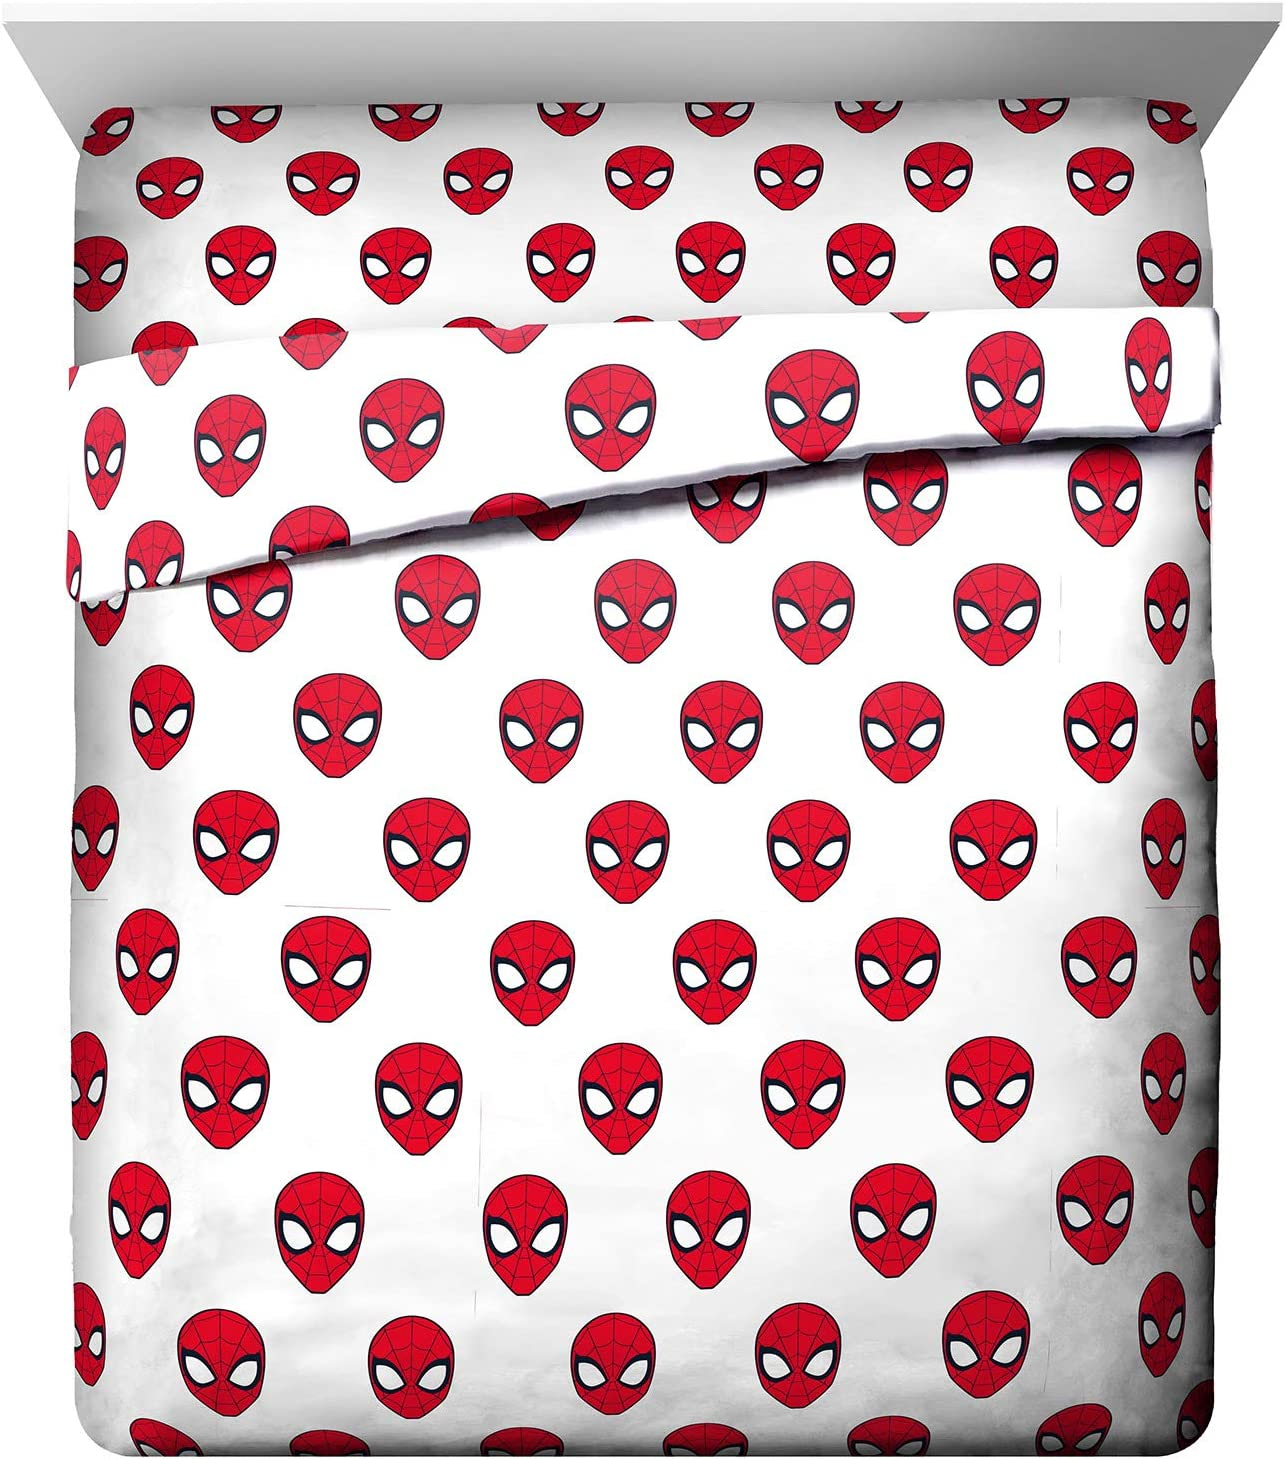 Marvel Spiderman Spidey Daze Queen Sheet Set - 4 Piece Set Super Soft and Cozy Kid's Bedding - Fade Resistant Microfiber Sheets (Official Marvel Product)